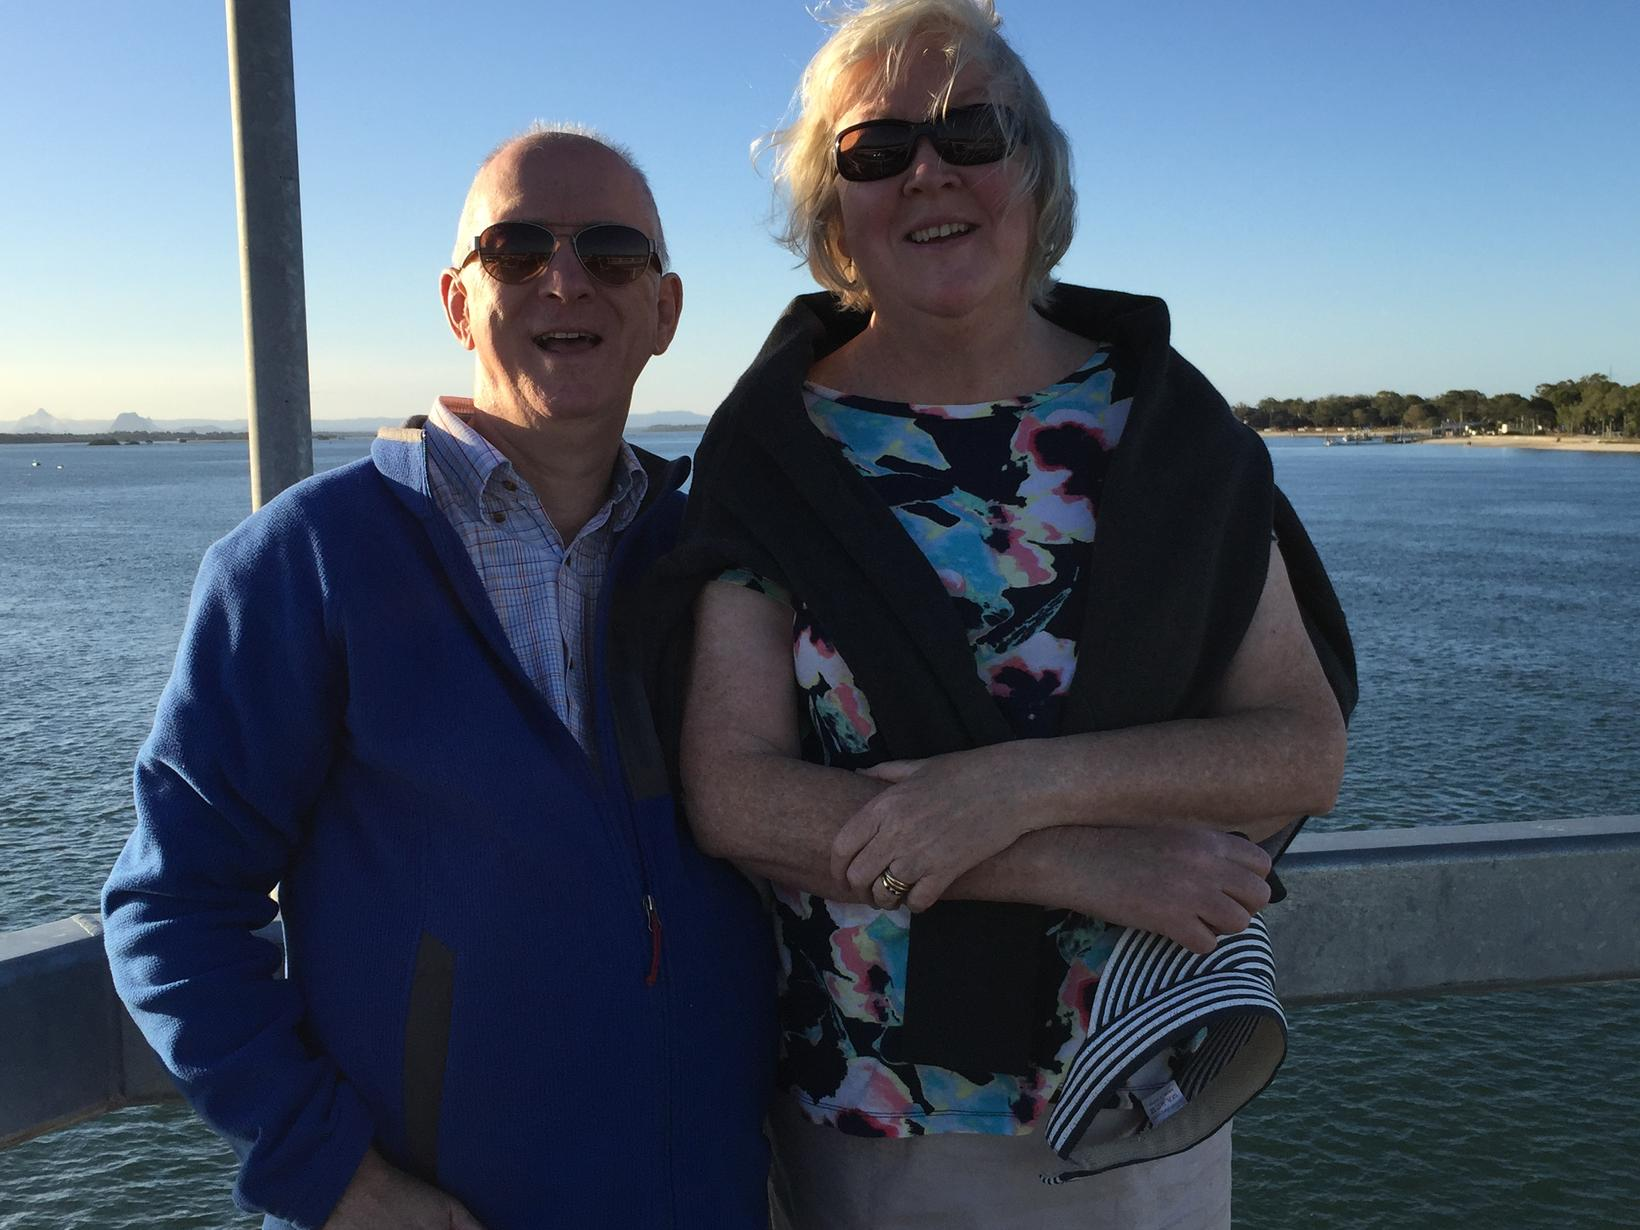 Stuart & Vicky from Blaxland, New South Wales, Australia